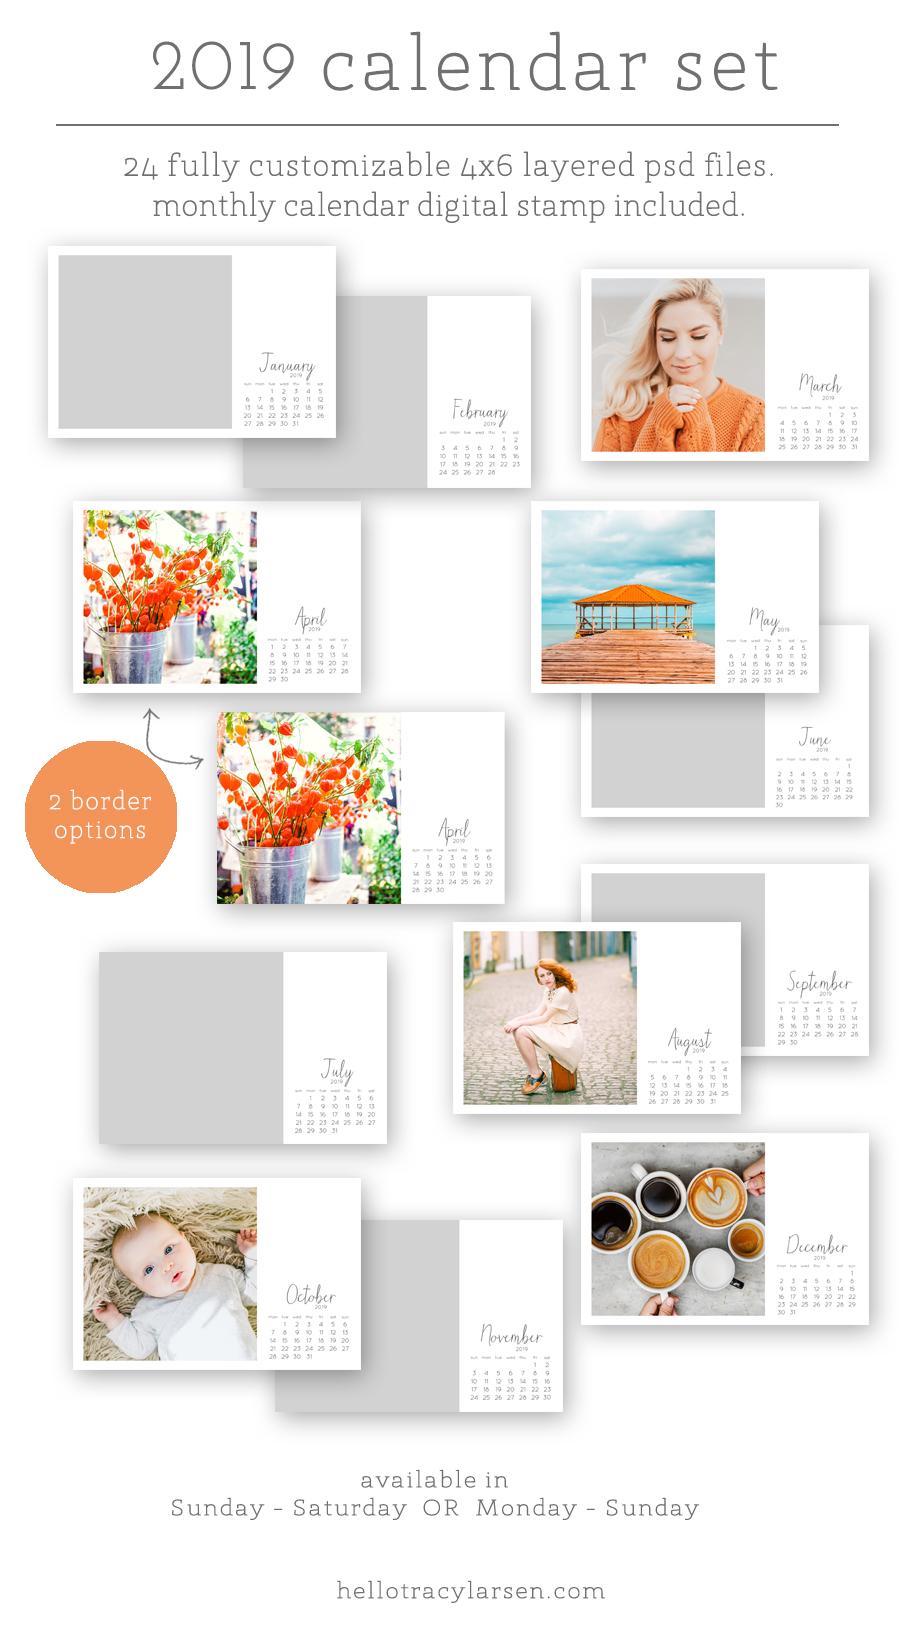 2019 digital calendar photo template 4x6   digital brush + stamp    Project Life    Digital Project Life   Modern Scrapbooking    Pocket Page Scrapbooking >>> HelloTracyLarsen.com